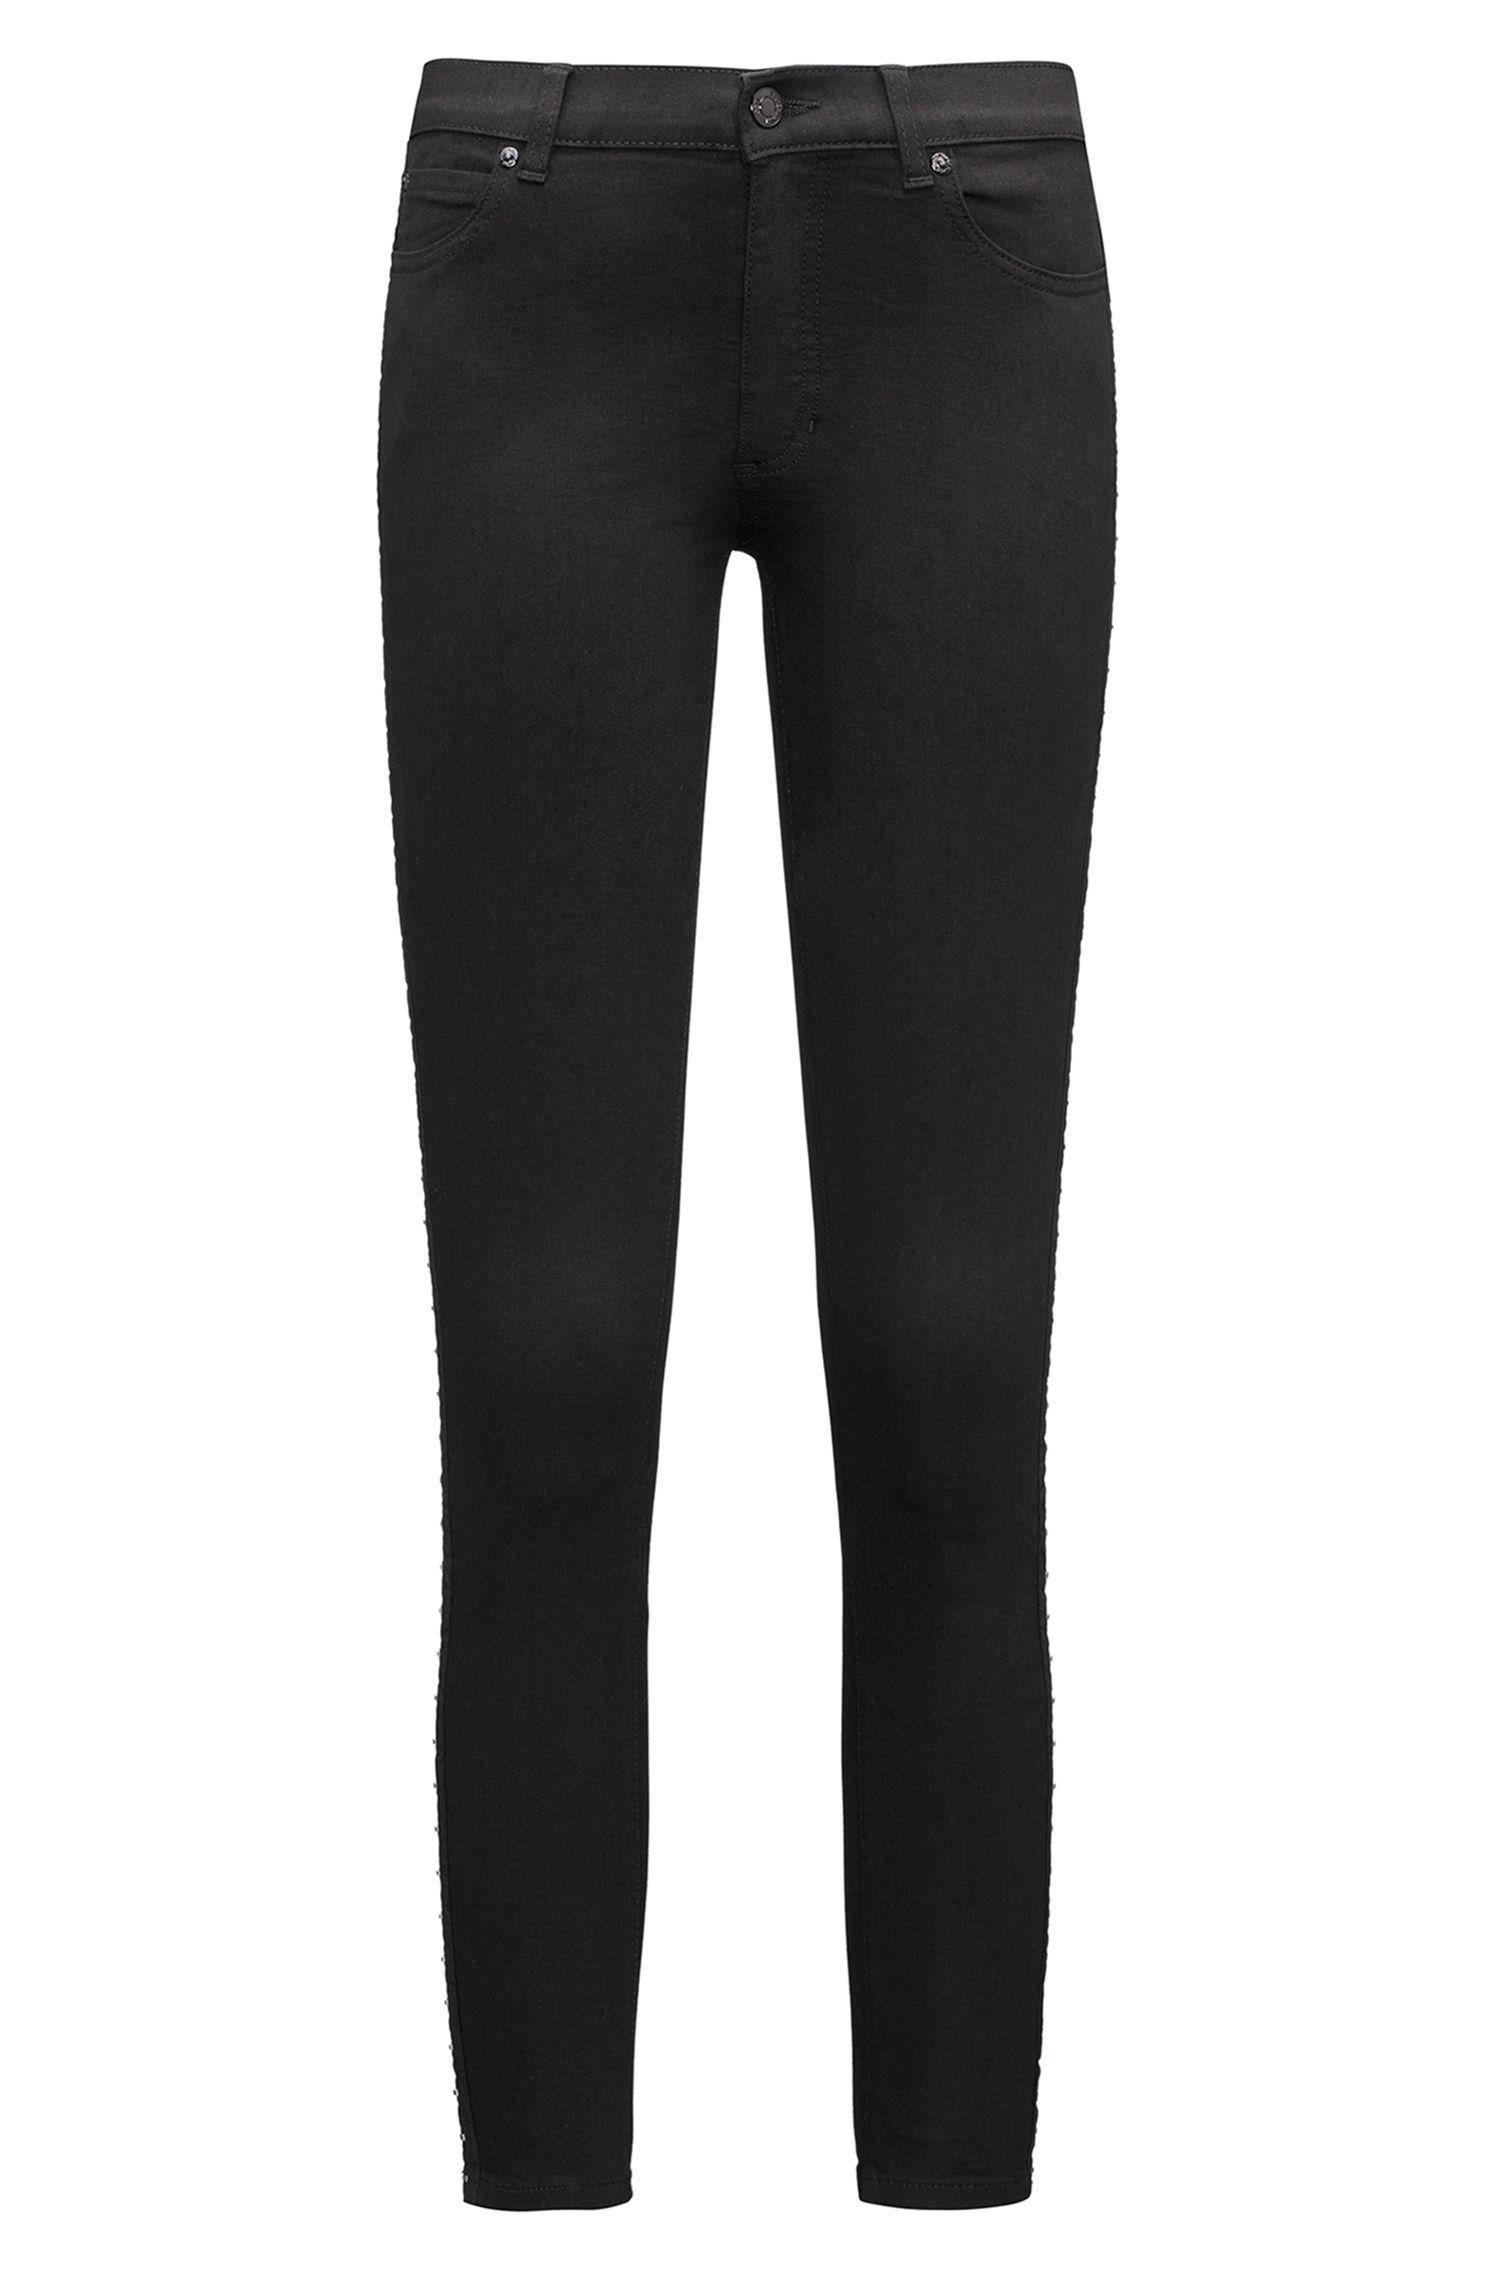 Jeans skinny fit con gancetti laterali